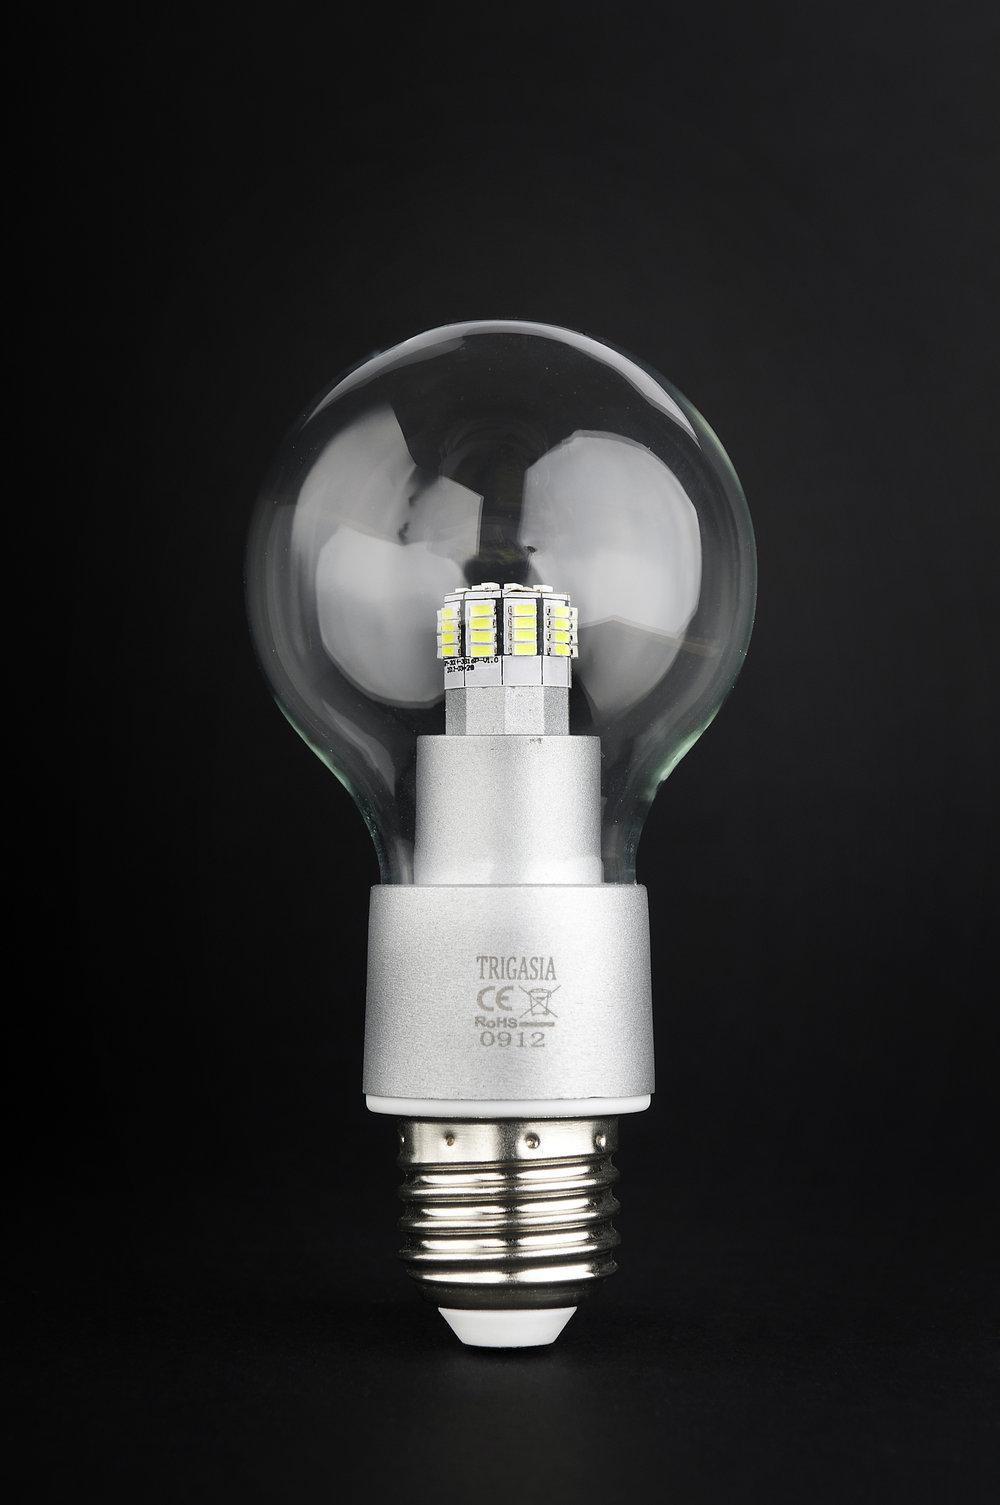 SERIE TG LED Lampadina óptica policarbonate Trasparente E27 48x 6W